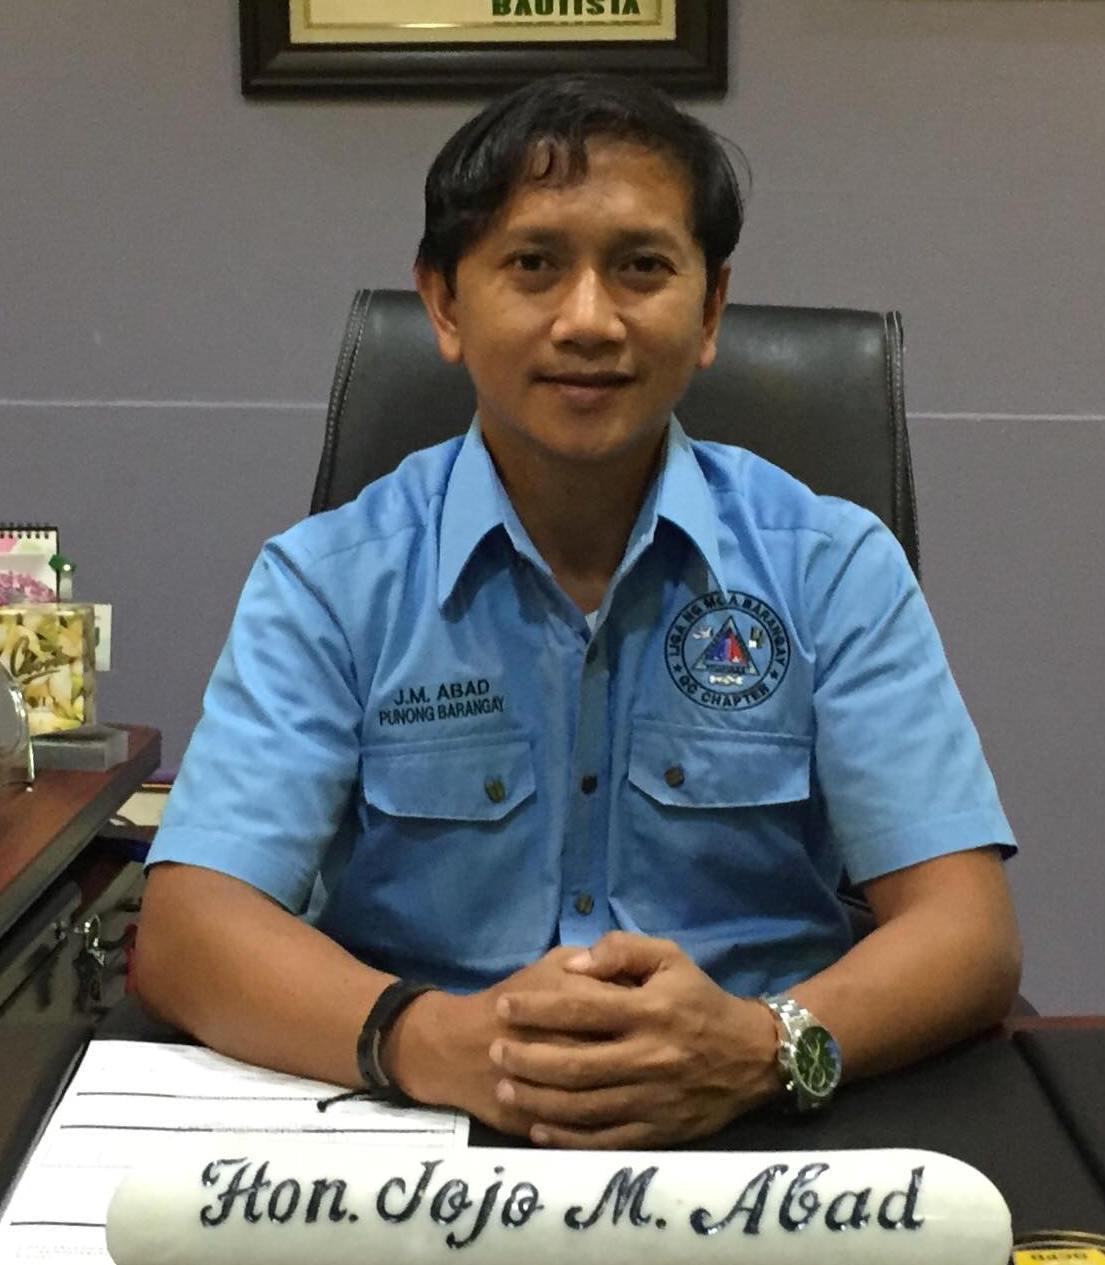 Kap. Jojo M. Abad